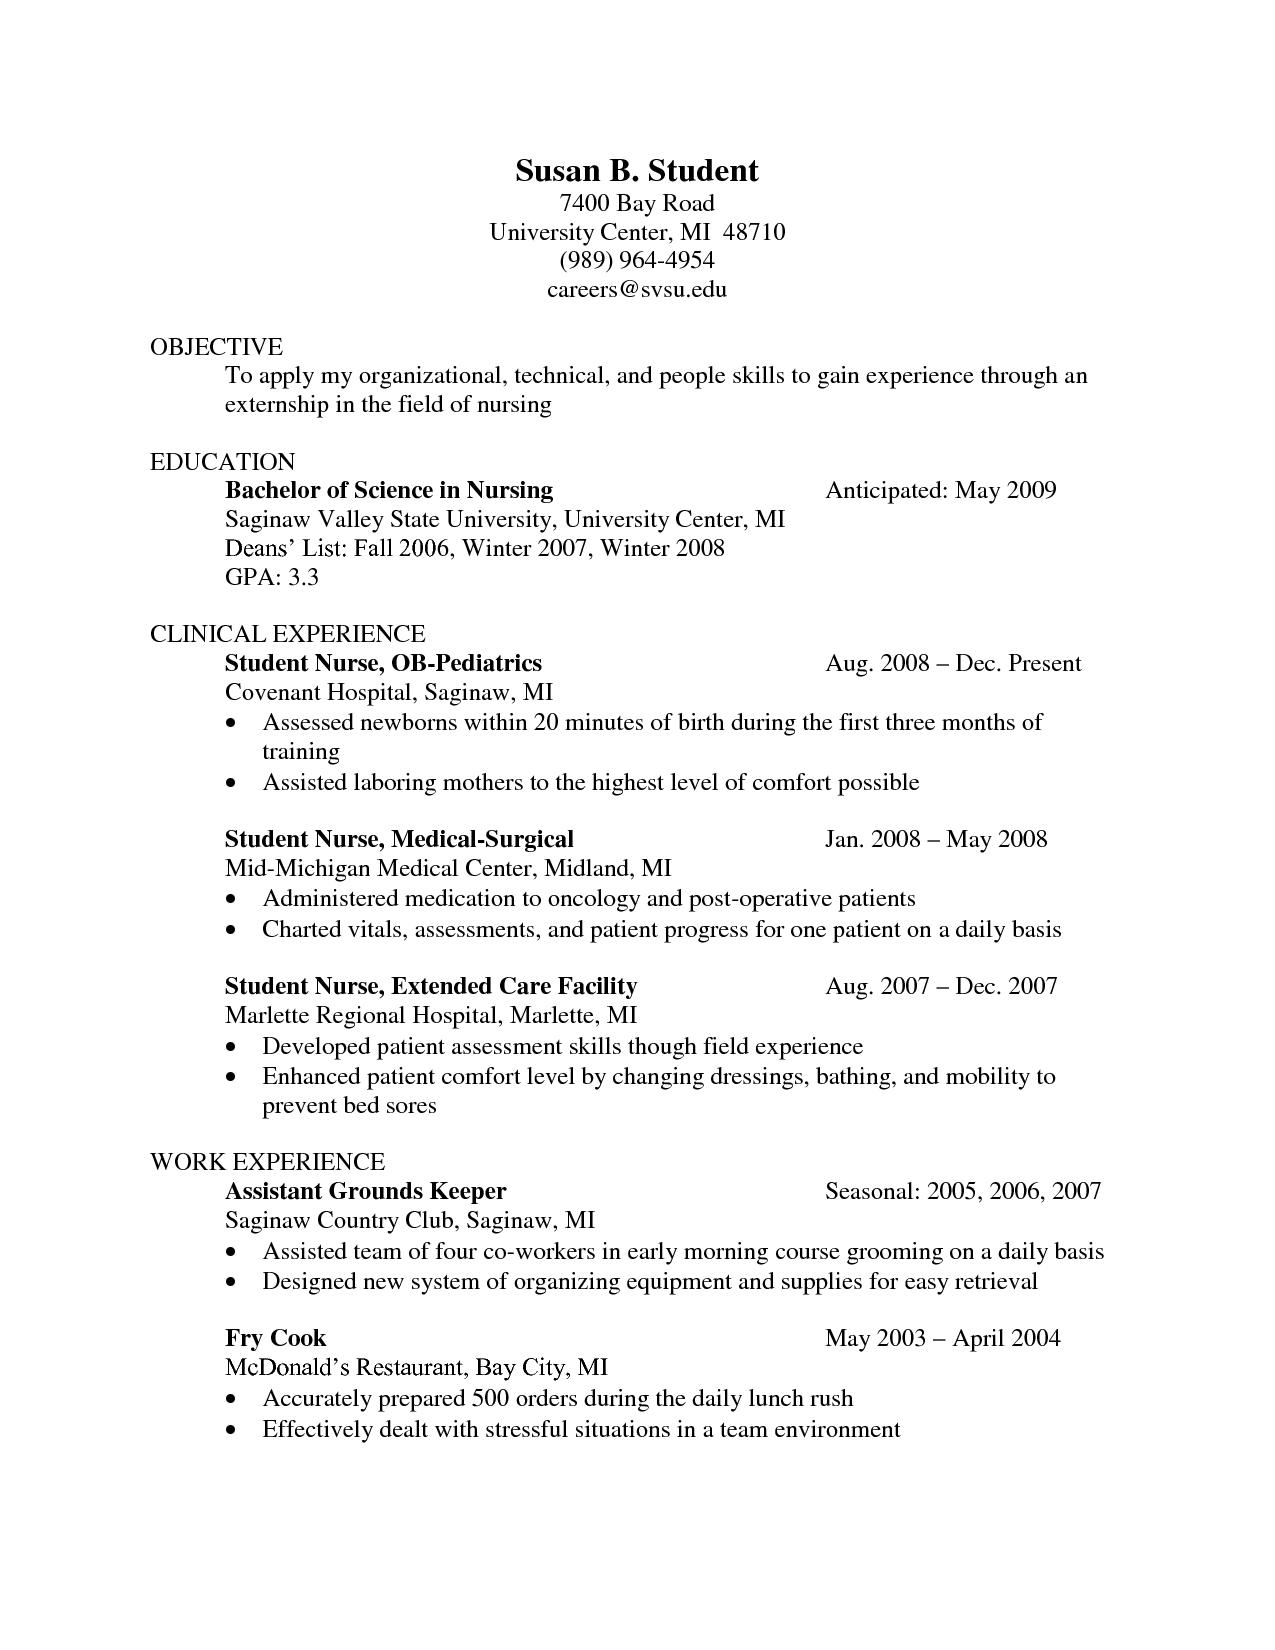 Graduate Nurse Resume Clinical Experience Resumes For Nursing